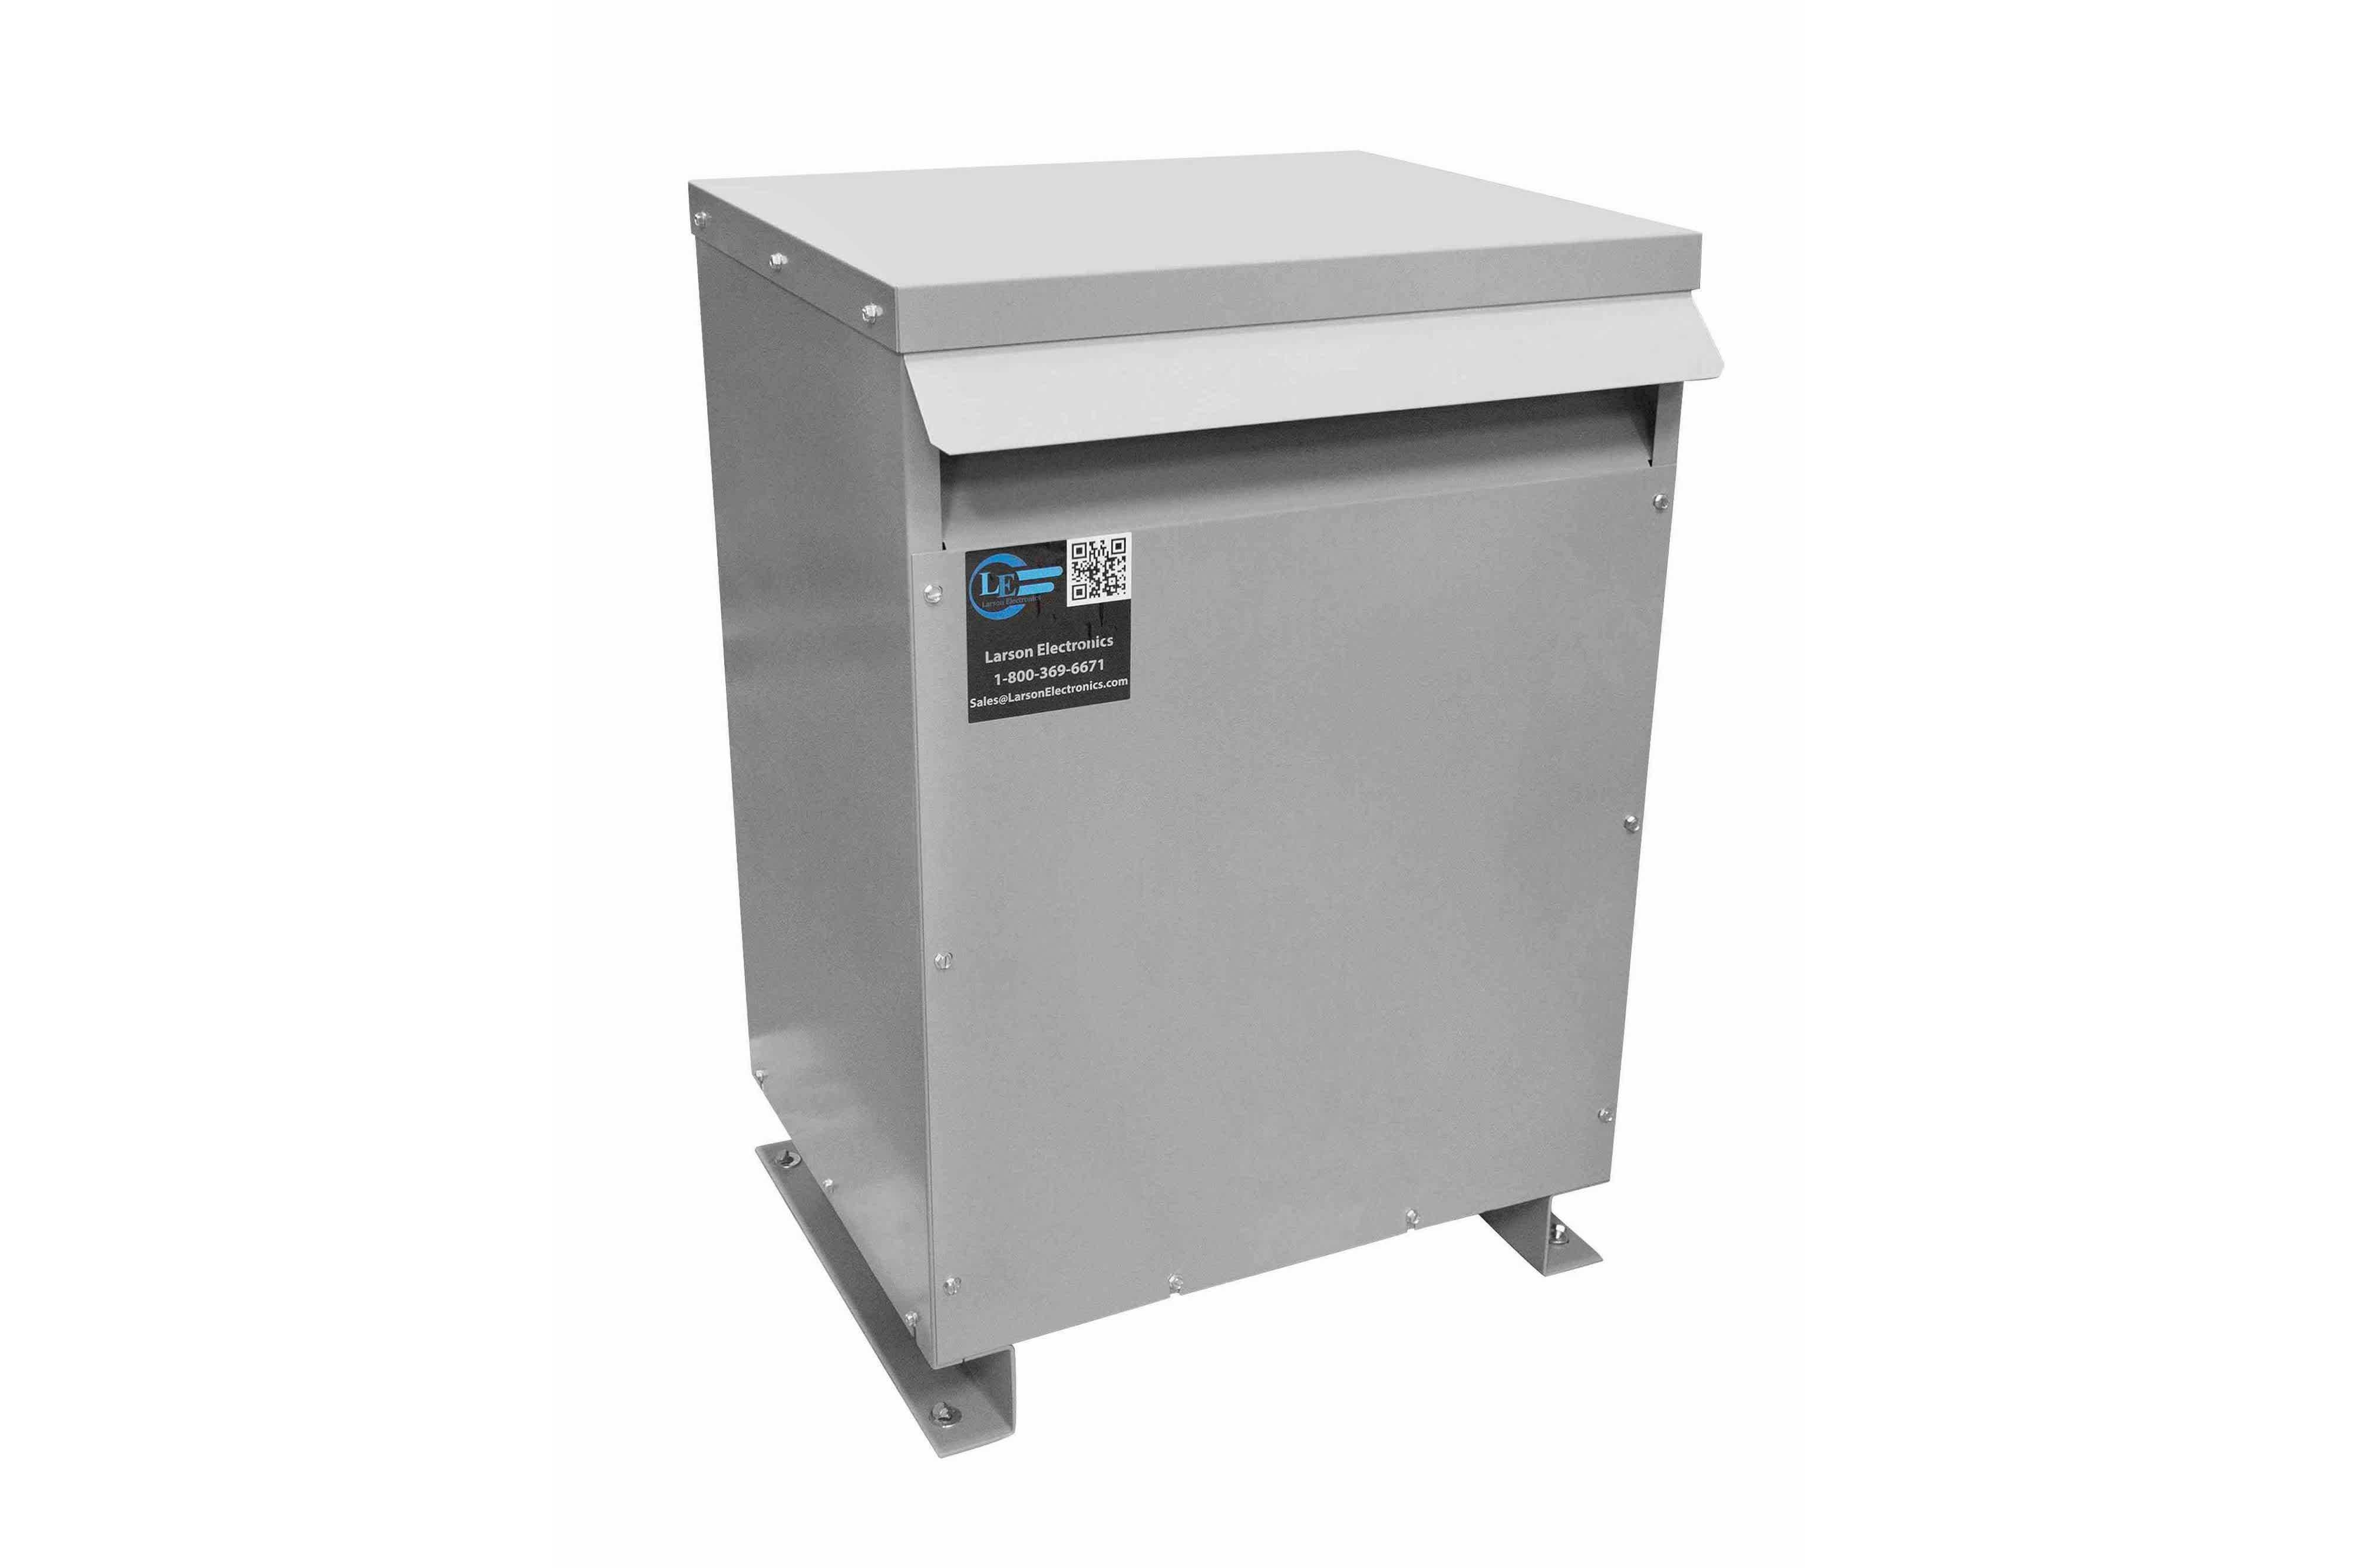 42.5 kVA 3PH Isolation Transformer, 240V Wye Primary, 415Y/240 Wye-N Secondary, N3R, Ventilated, 60 Hz